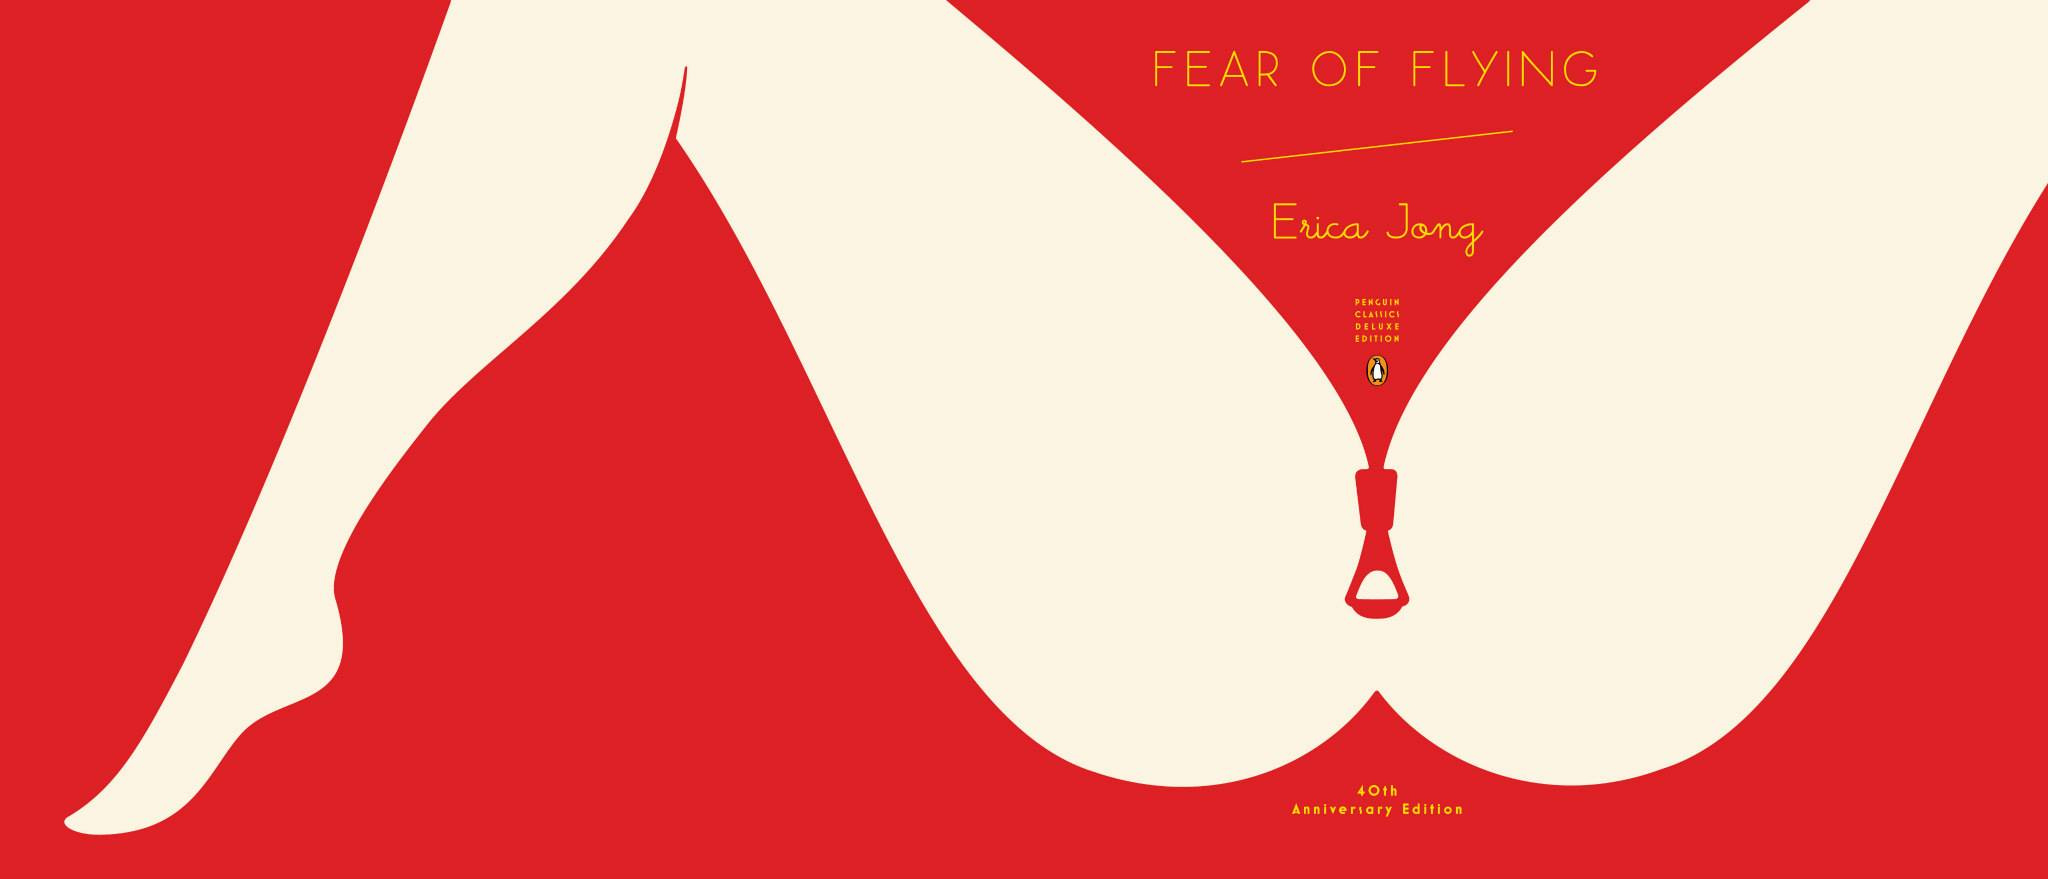 noma-bar-fear-of-flying.jpg